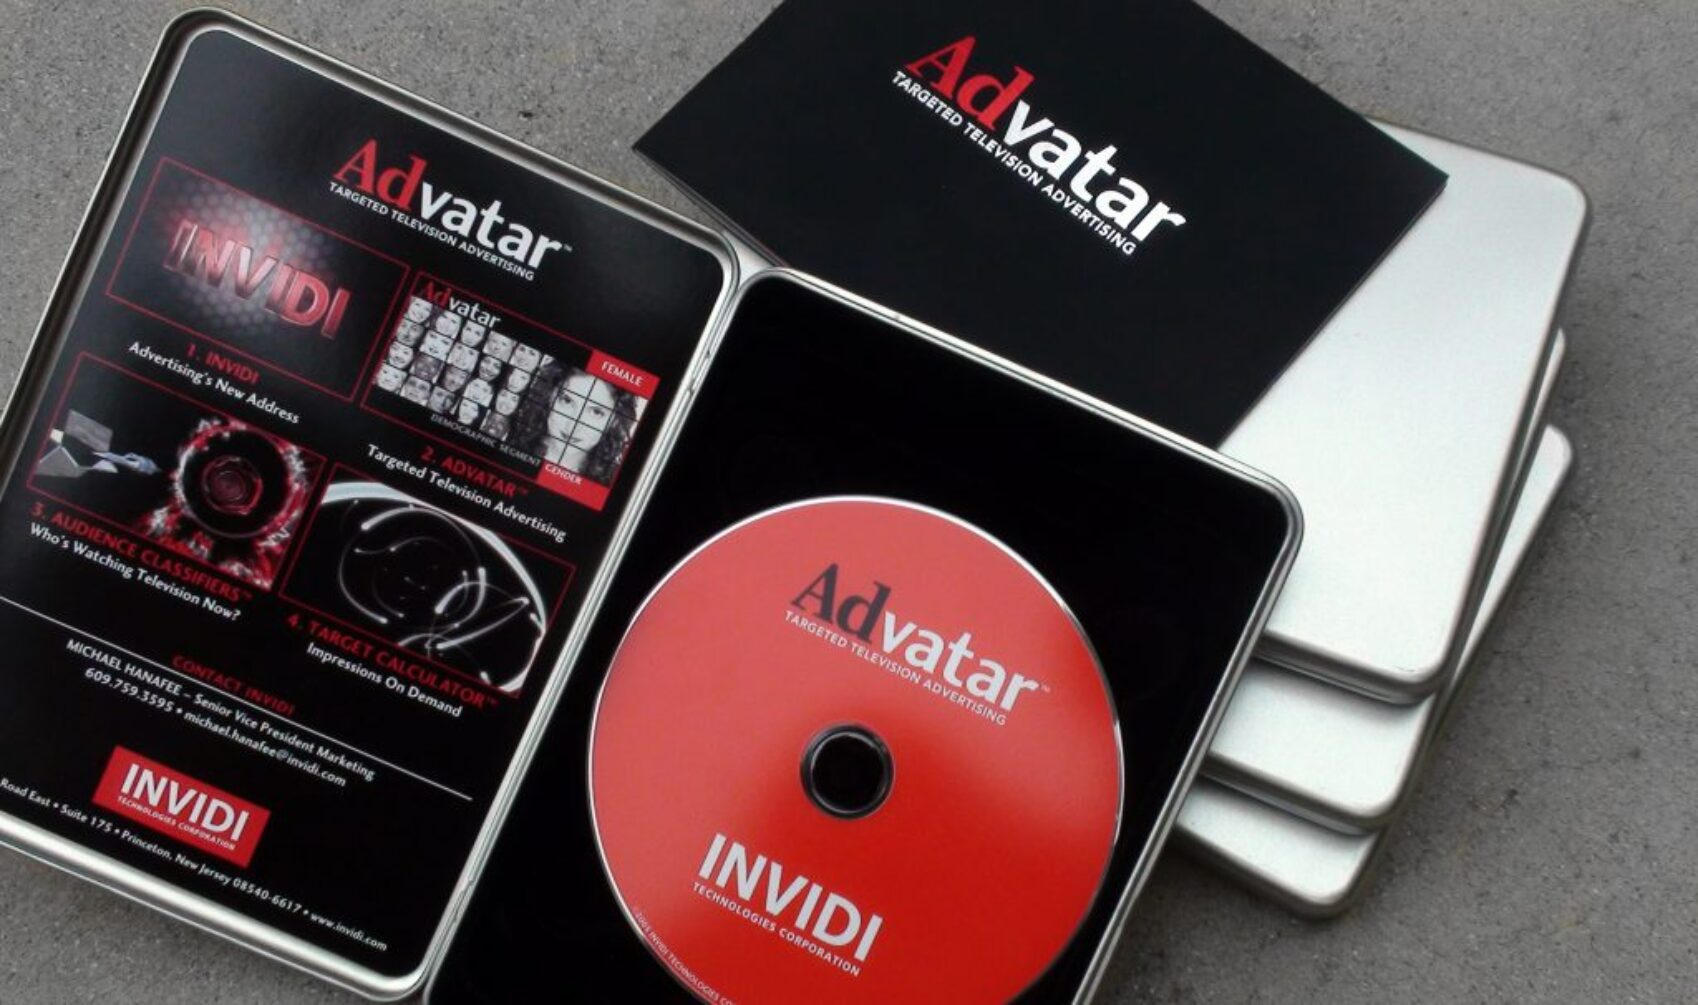 INVIDI DVD Tin_4827